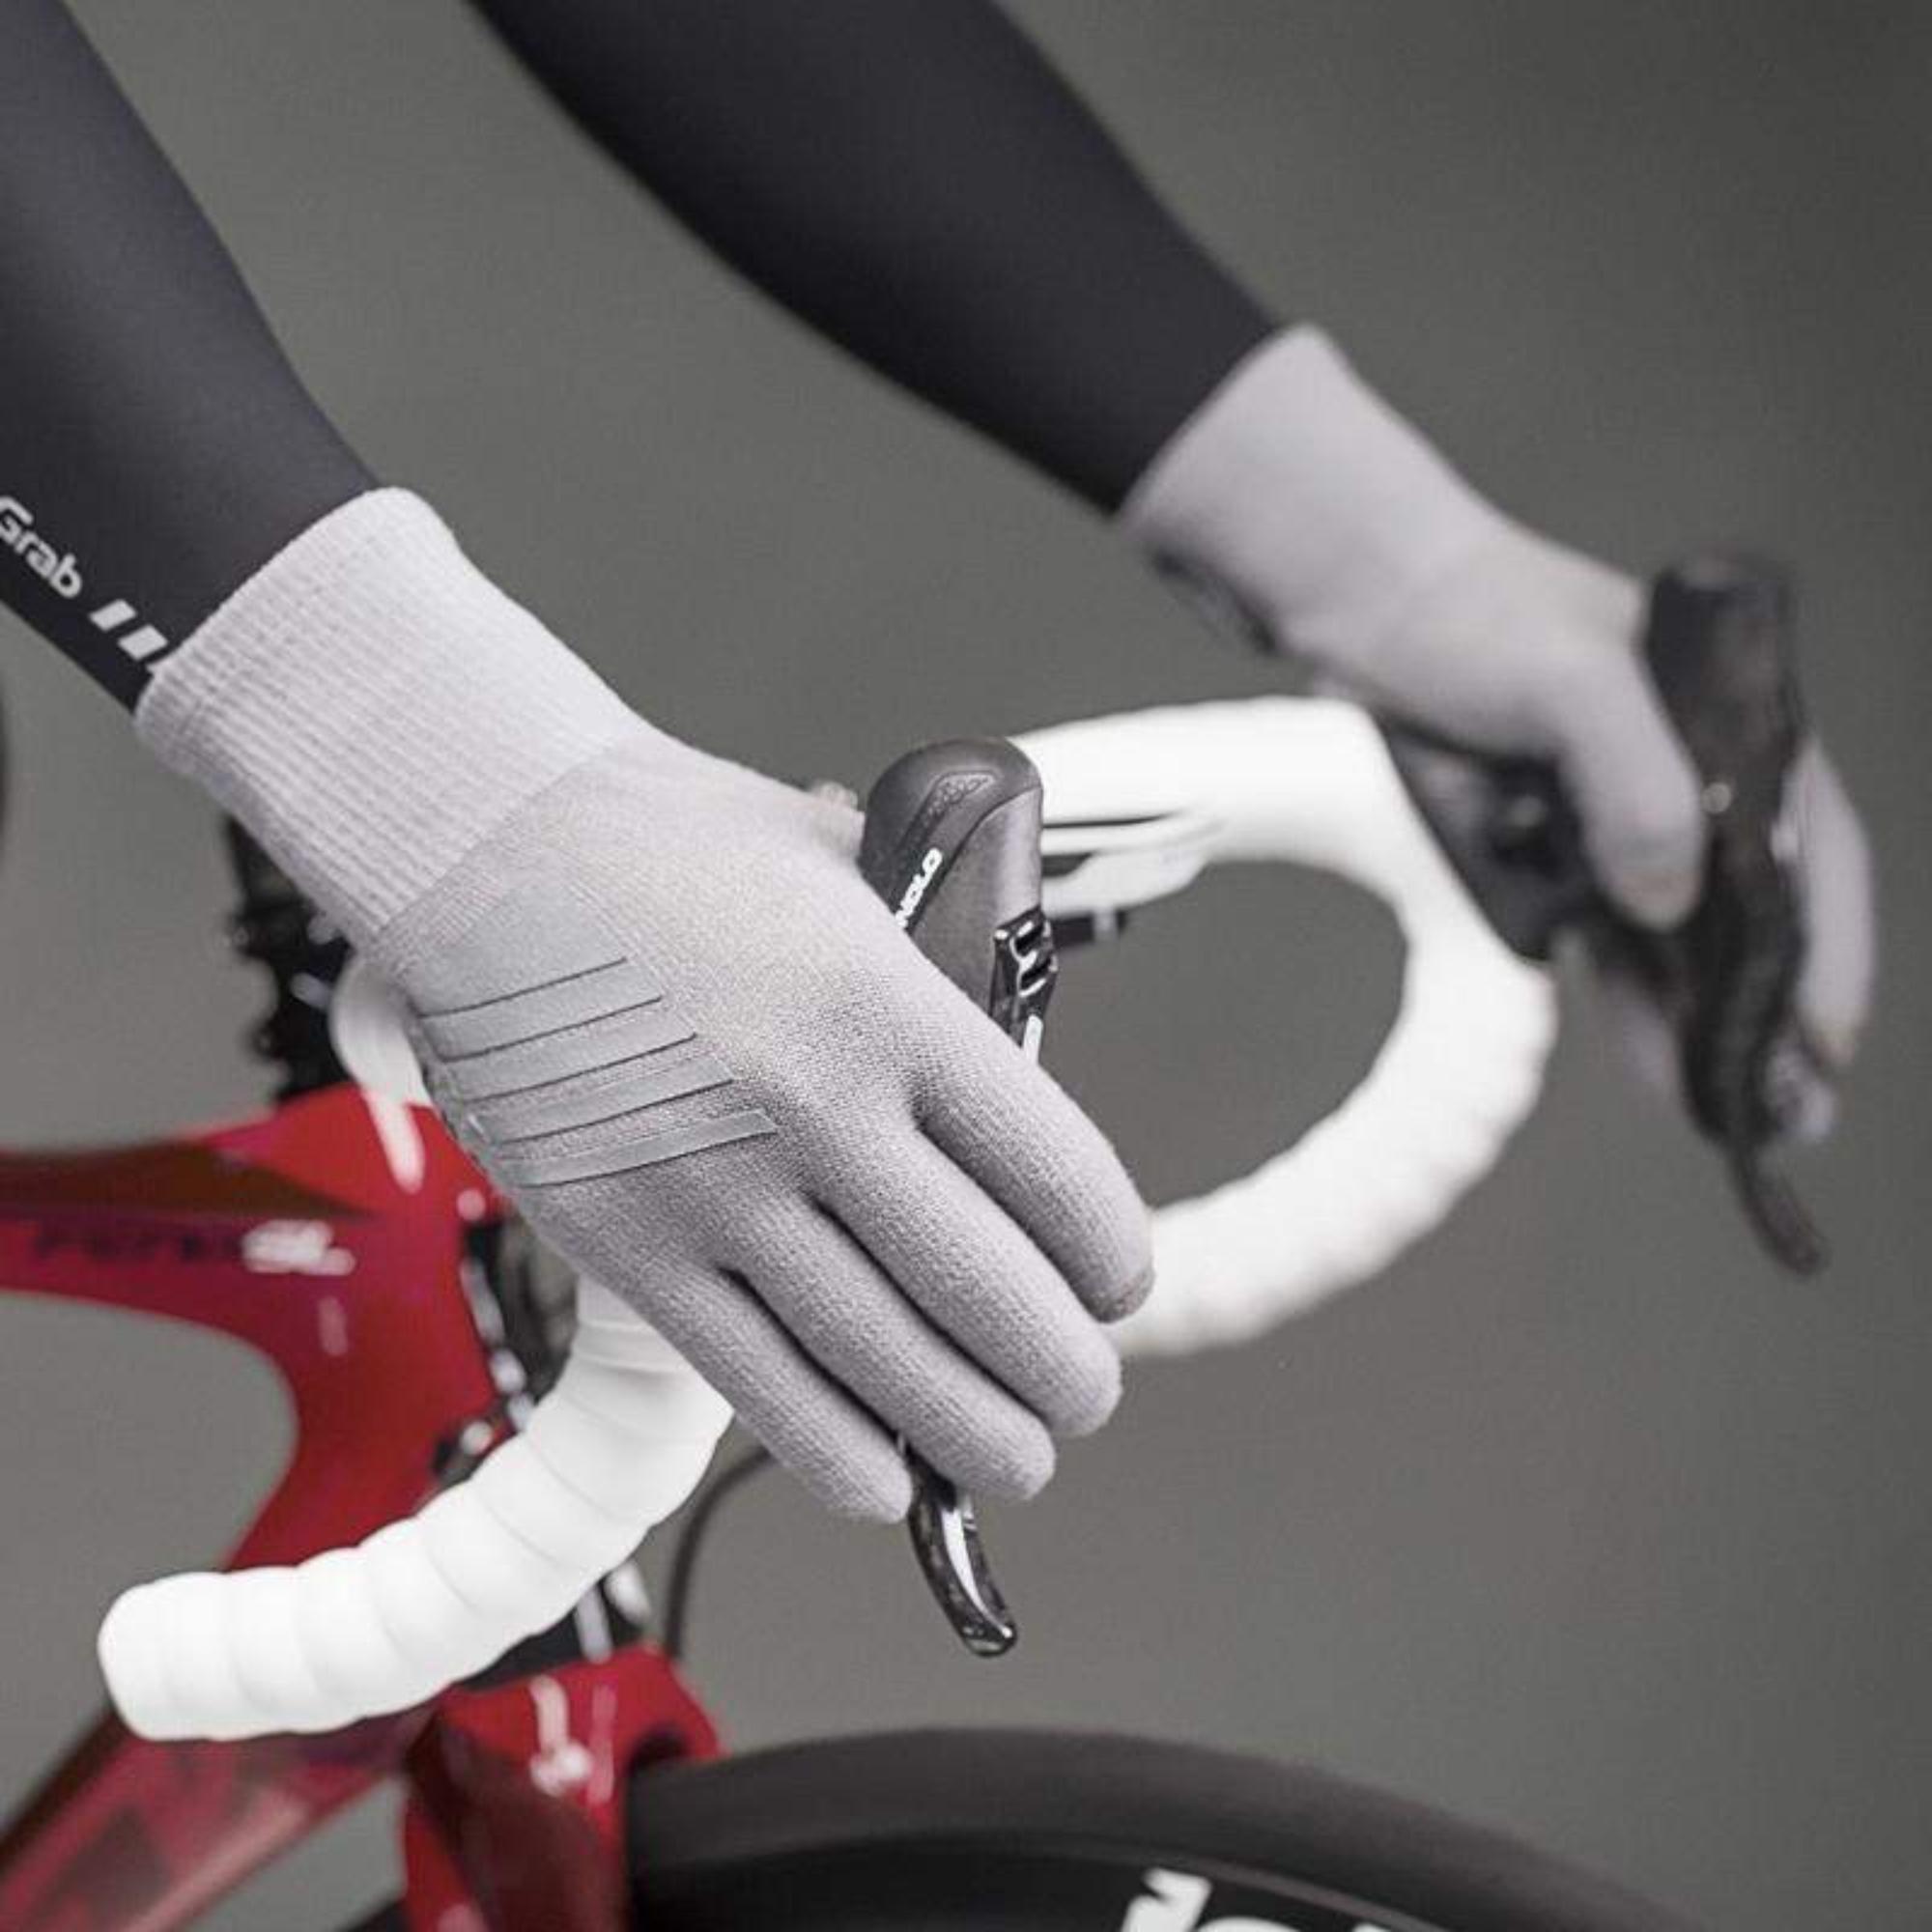 Mtb Bike Cycling Cycle Gloves Grey Gripgrab Merino Liner Road Mountain Sport En Vakantie Handschoenen Ishule Co Ke